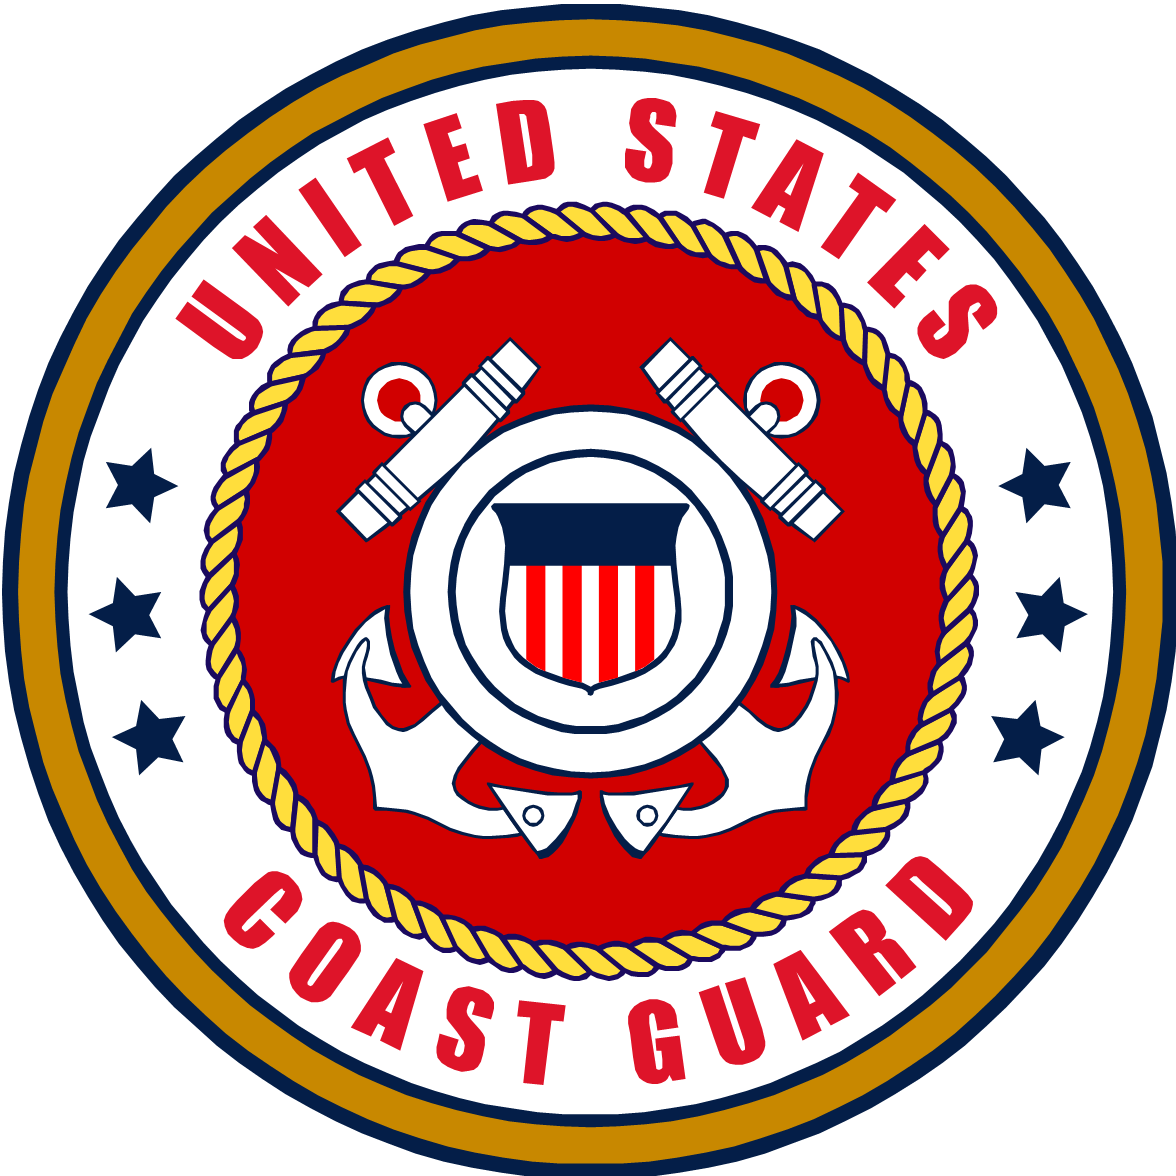 us-coast-guard-golf-cart-tire-supply-02.png